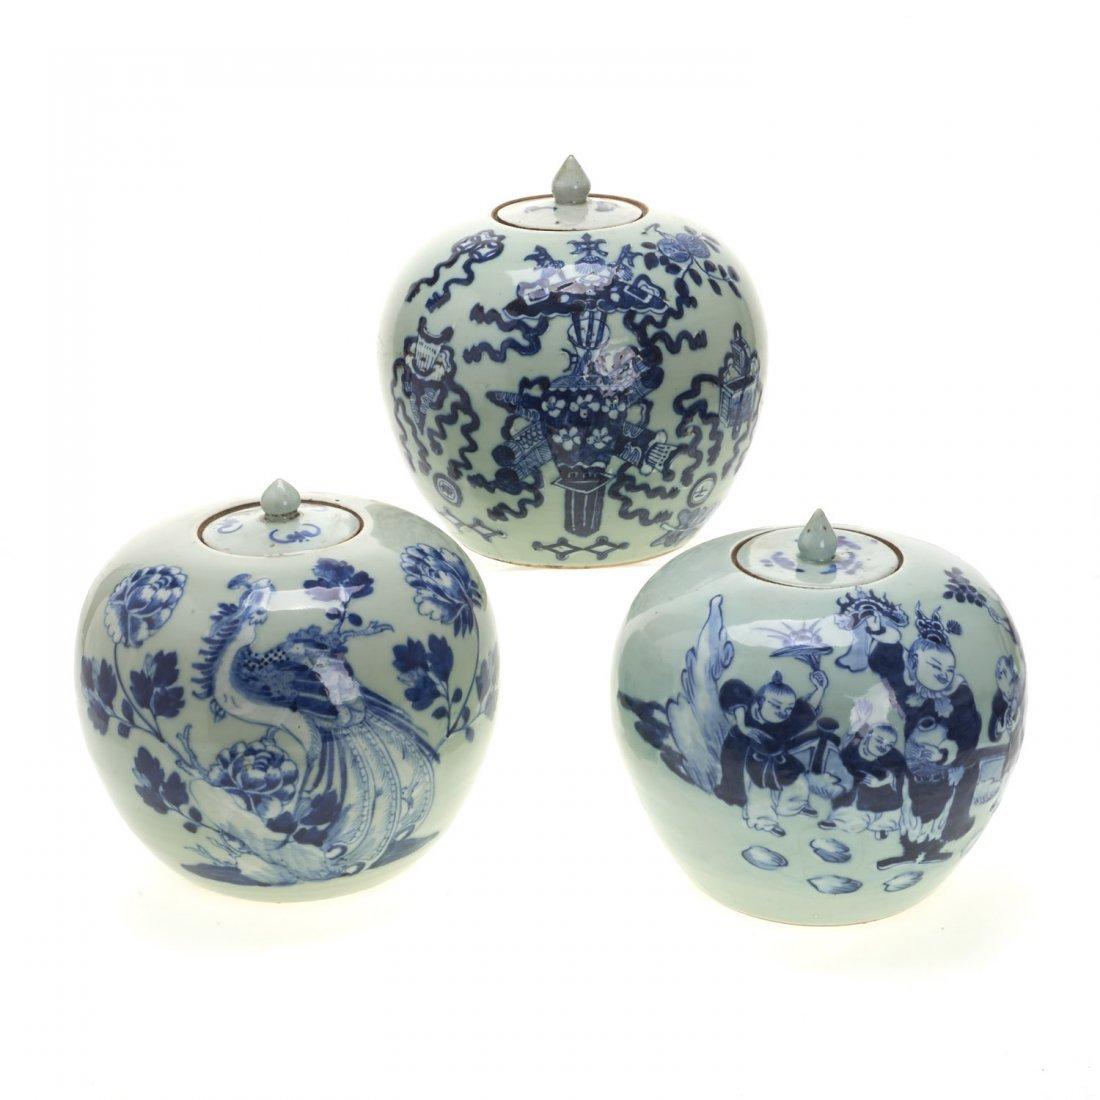 (3) Chinese blue and white globular covered jars